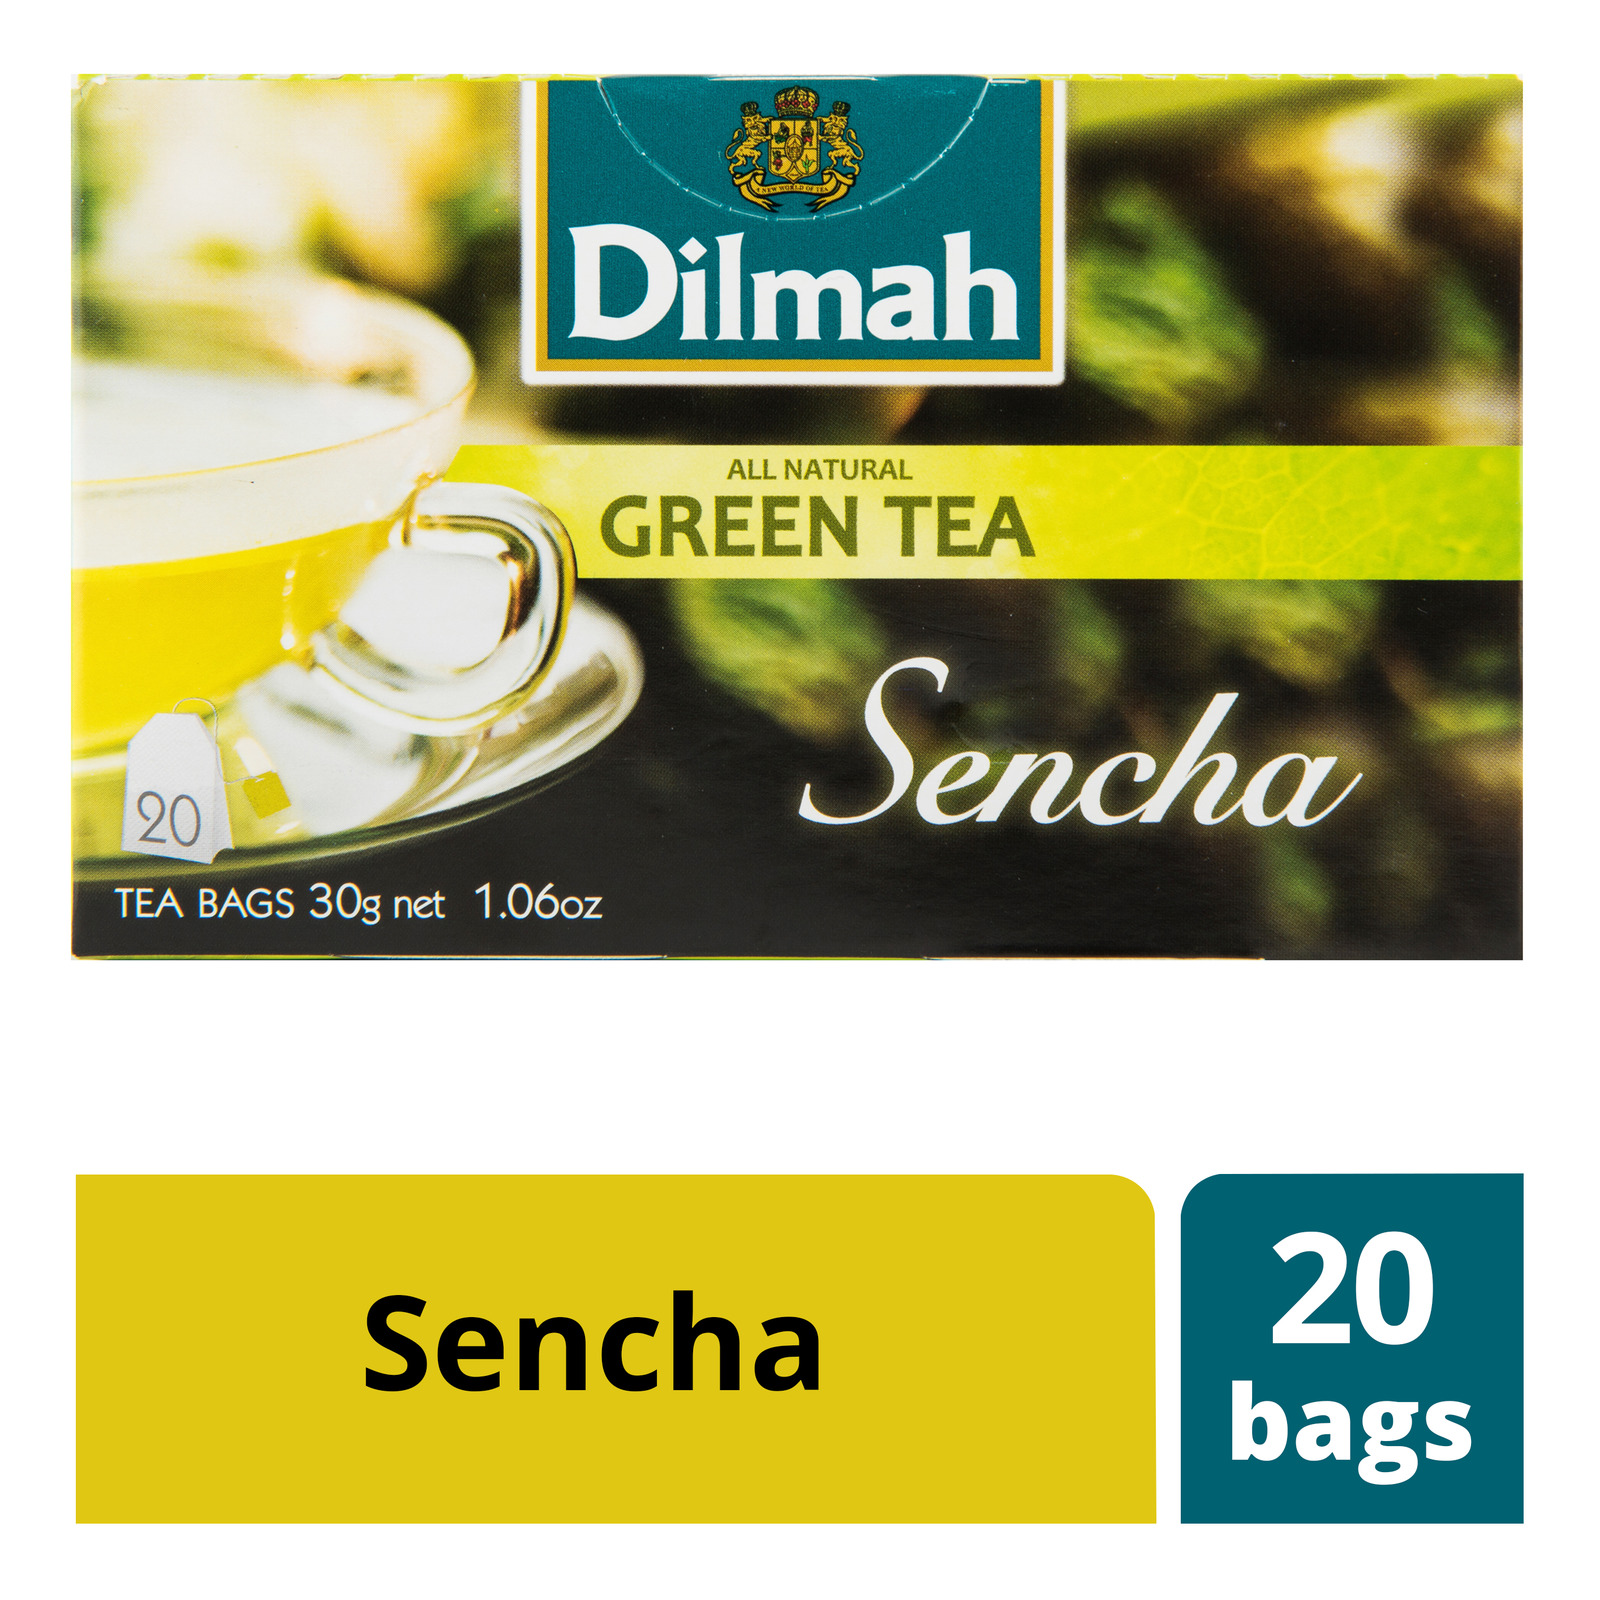 Dilmah Tea Bags - Sencha Green Tea